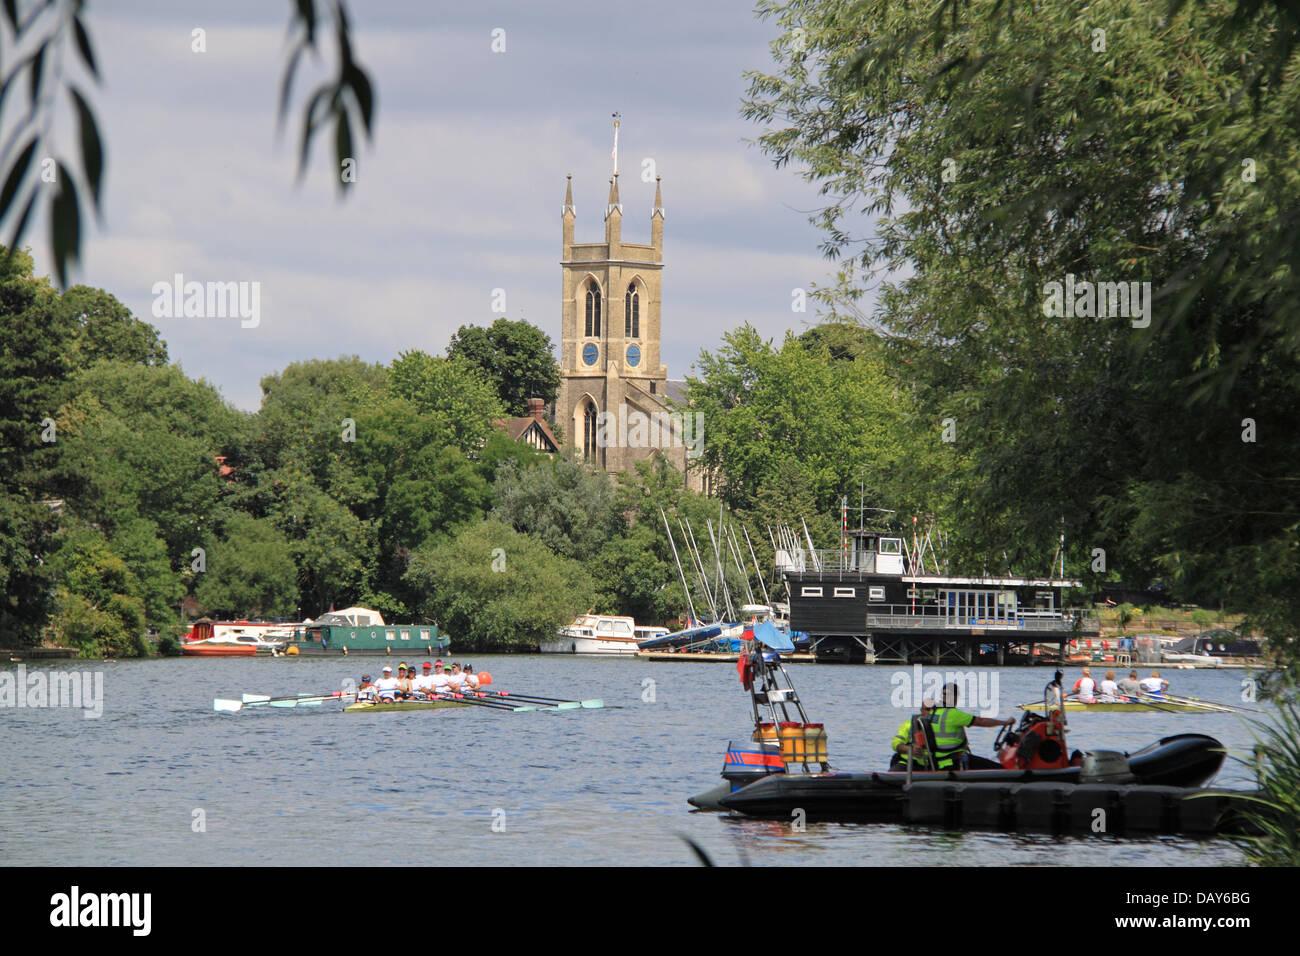 Cambridge University Women's Boat Club women's coxed eight at Molesey Amateur Regatta, 20th July 2013, River - Stock Image